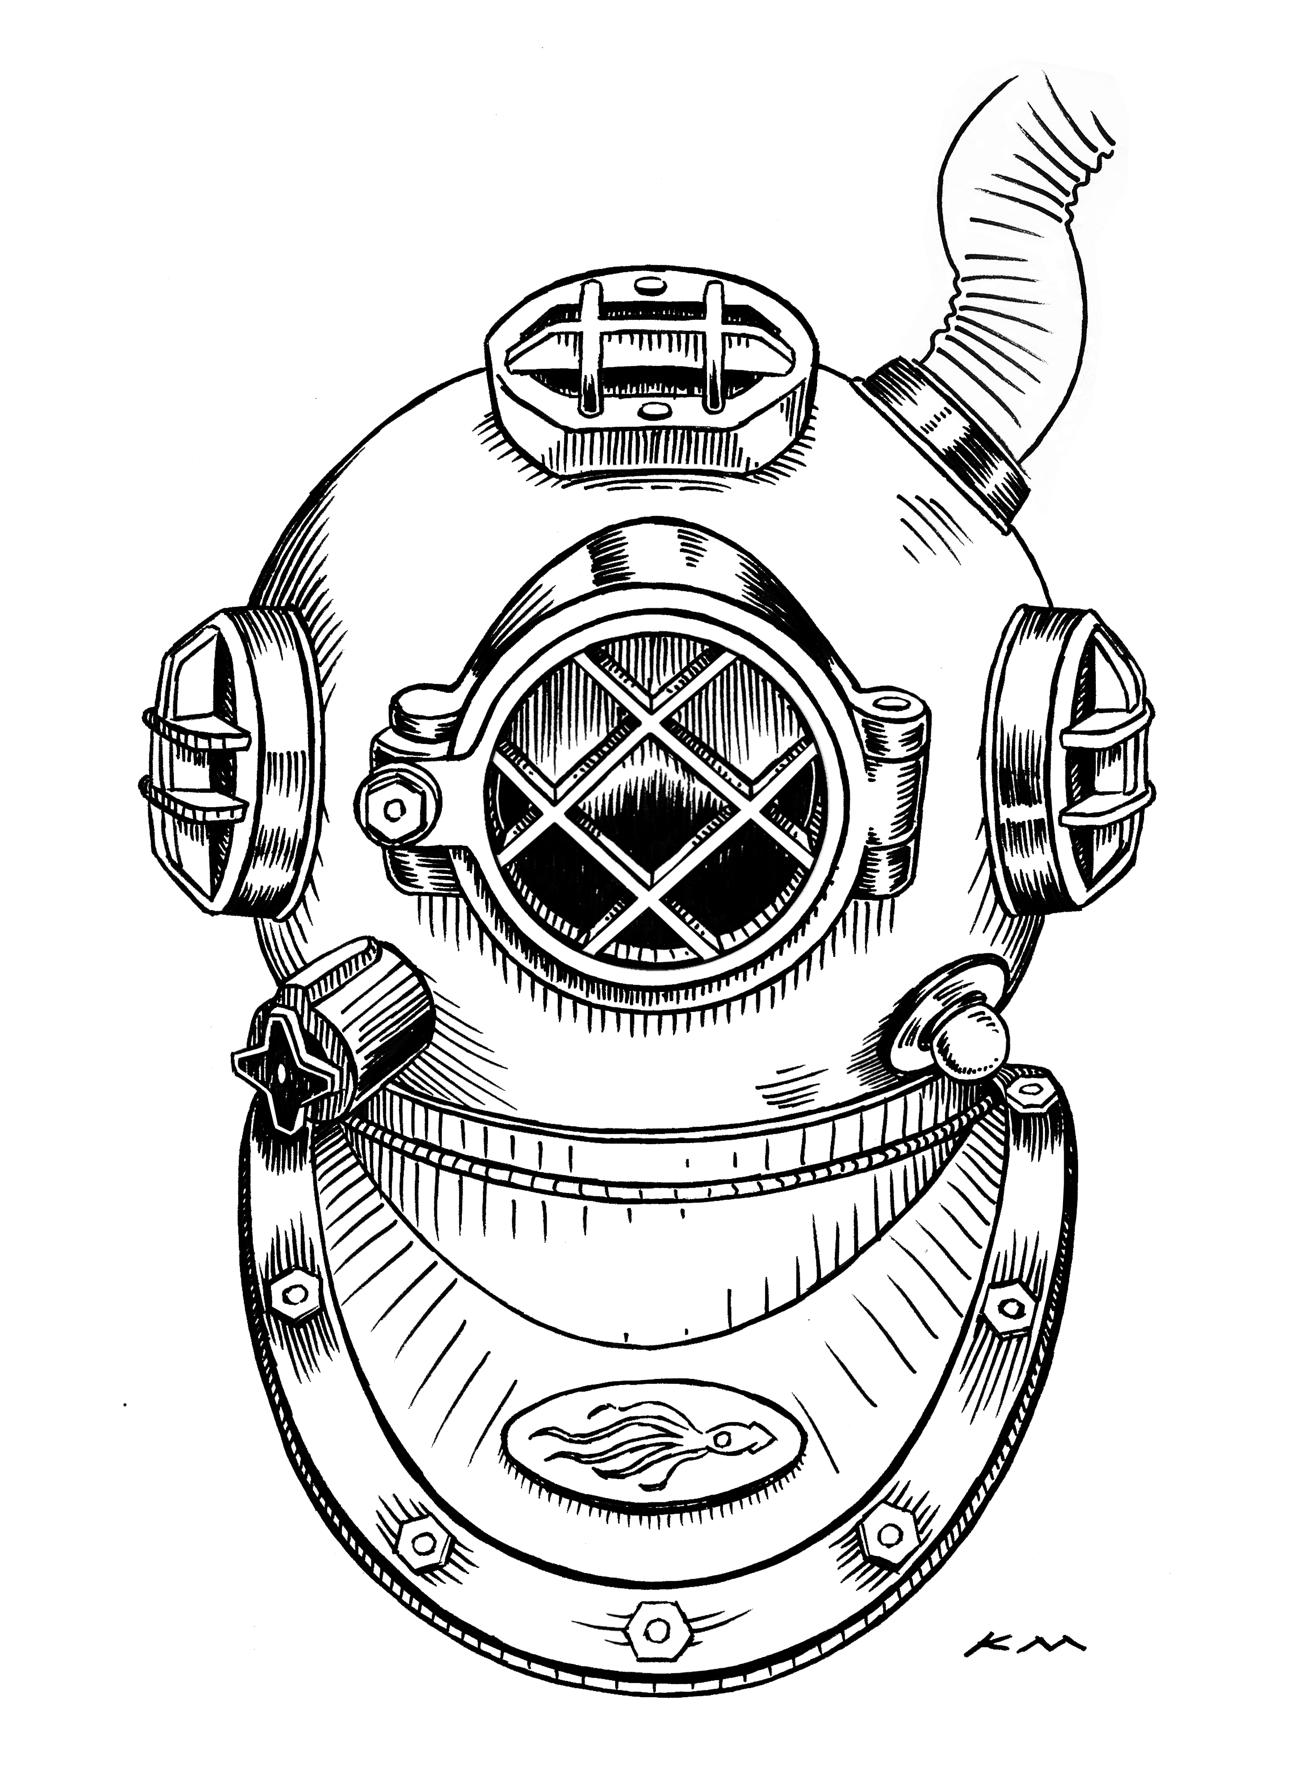 """Diving Helmet"" (c) Ken Molnar 2013. Ink on paper ..."